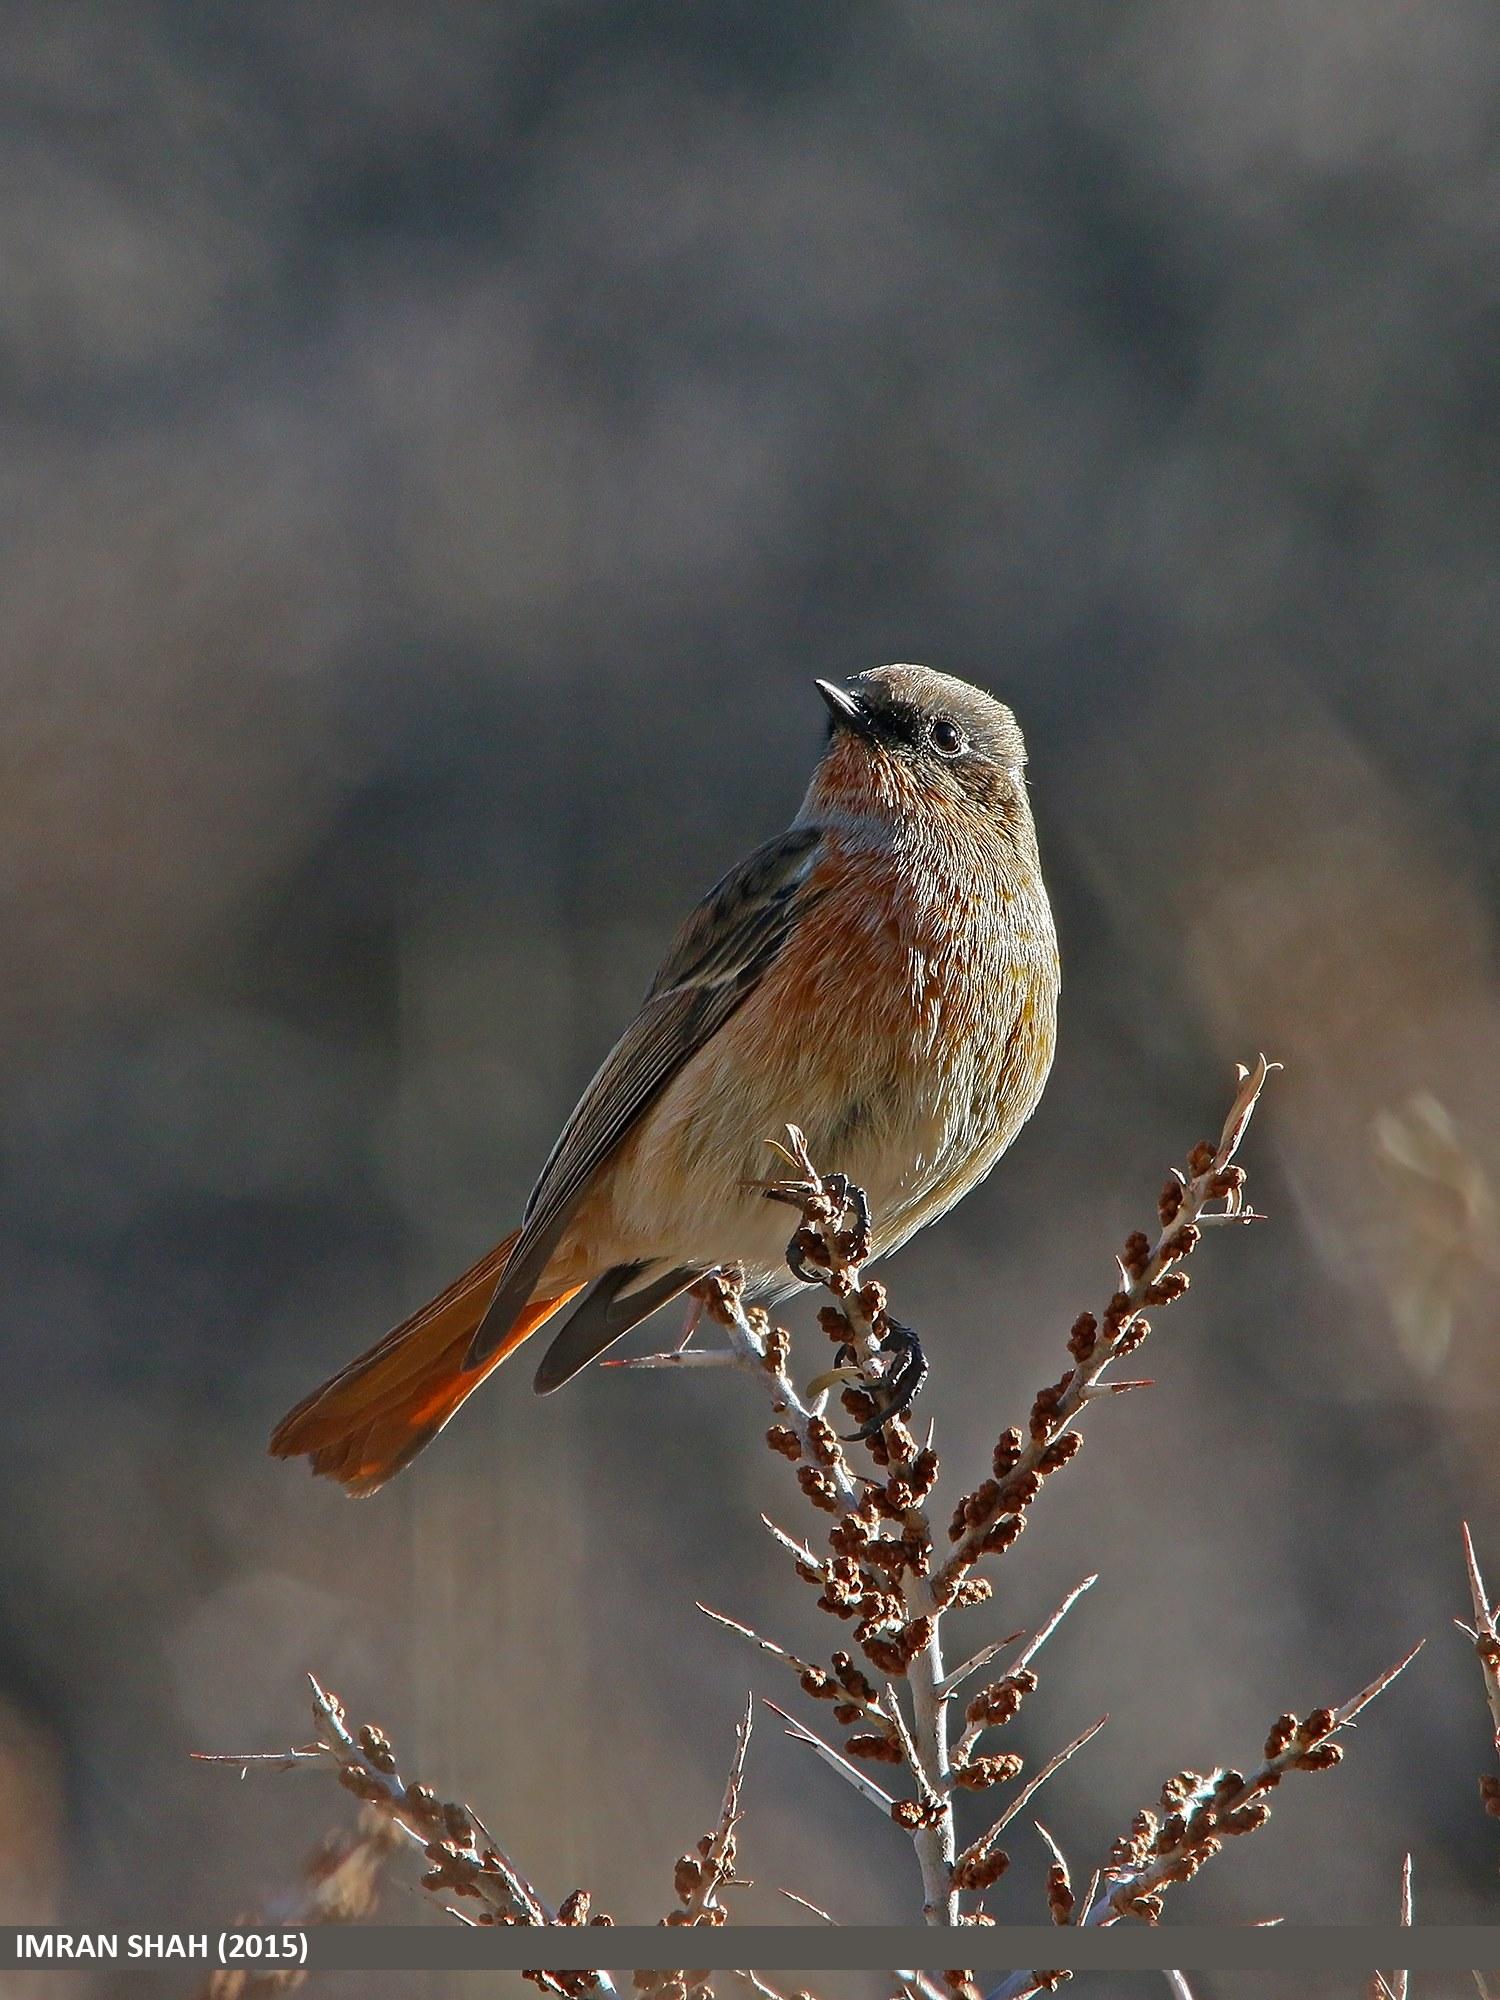 Rufous-backed Redstart (Phoenicurus erythronotus) captured at Borit, Gojal, Gilgit-Baltistan, Pakistan